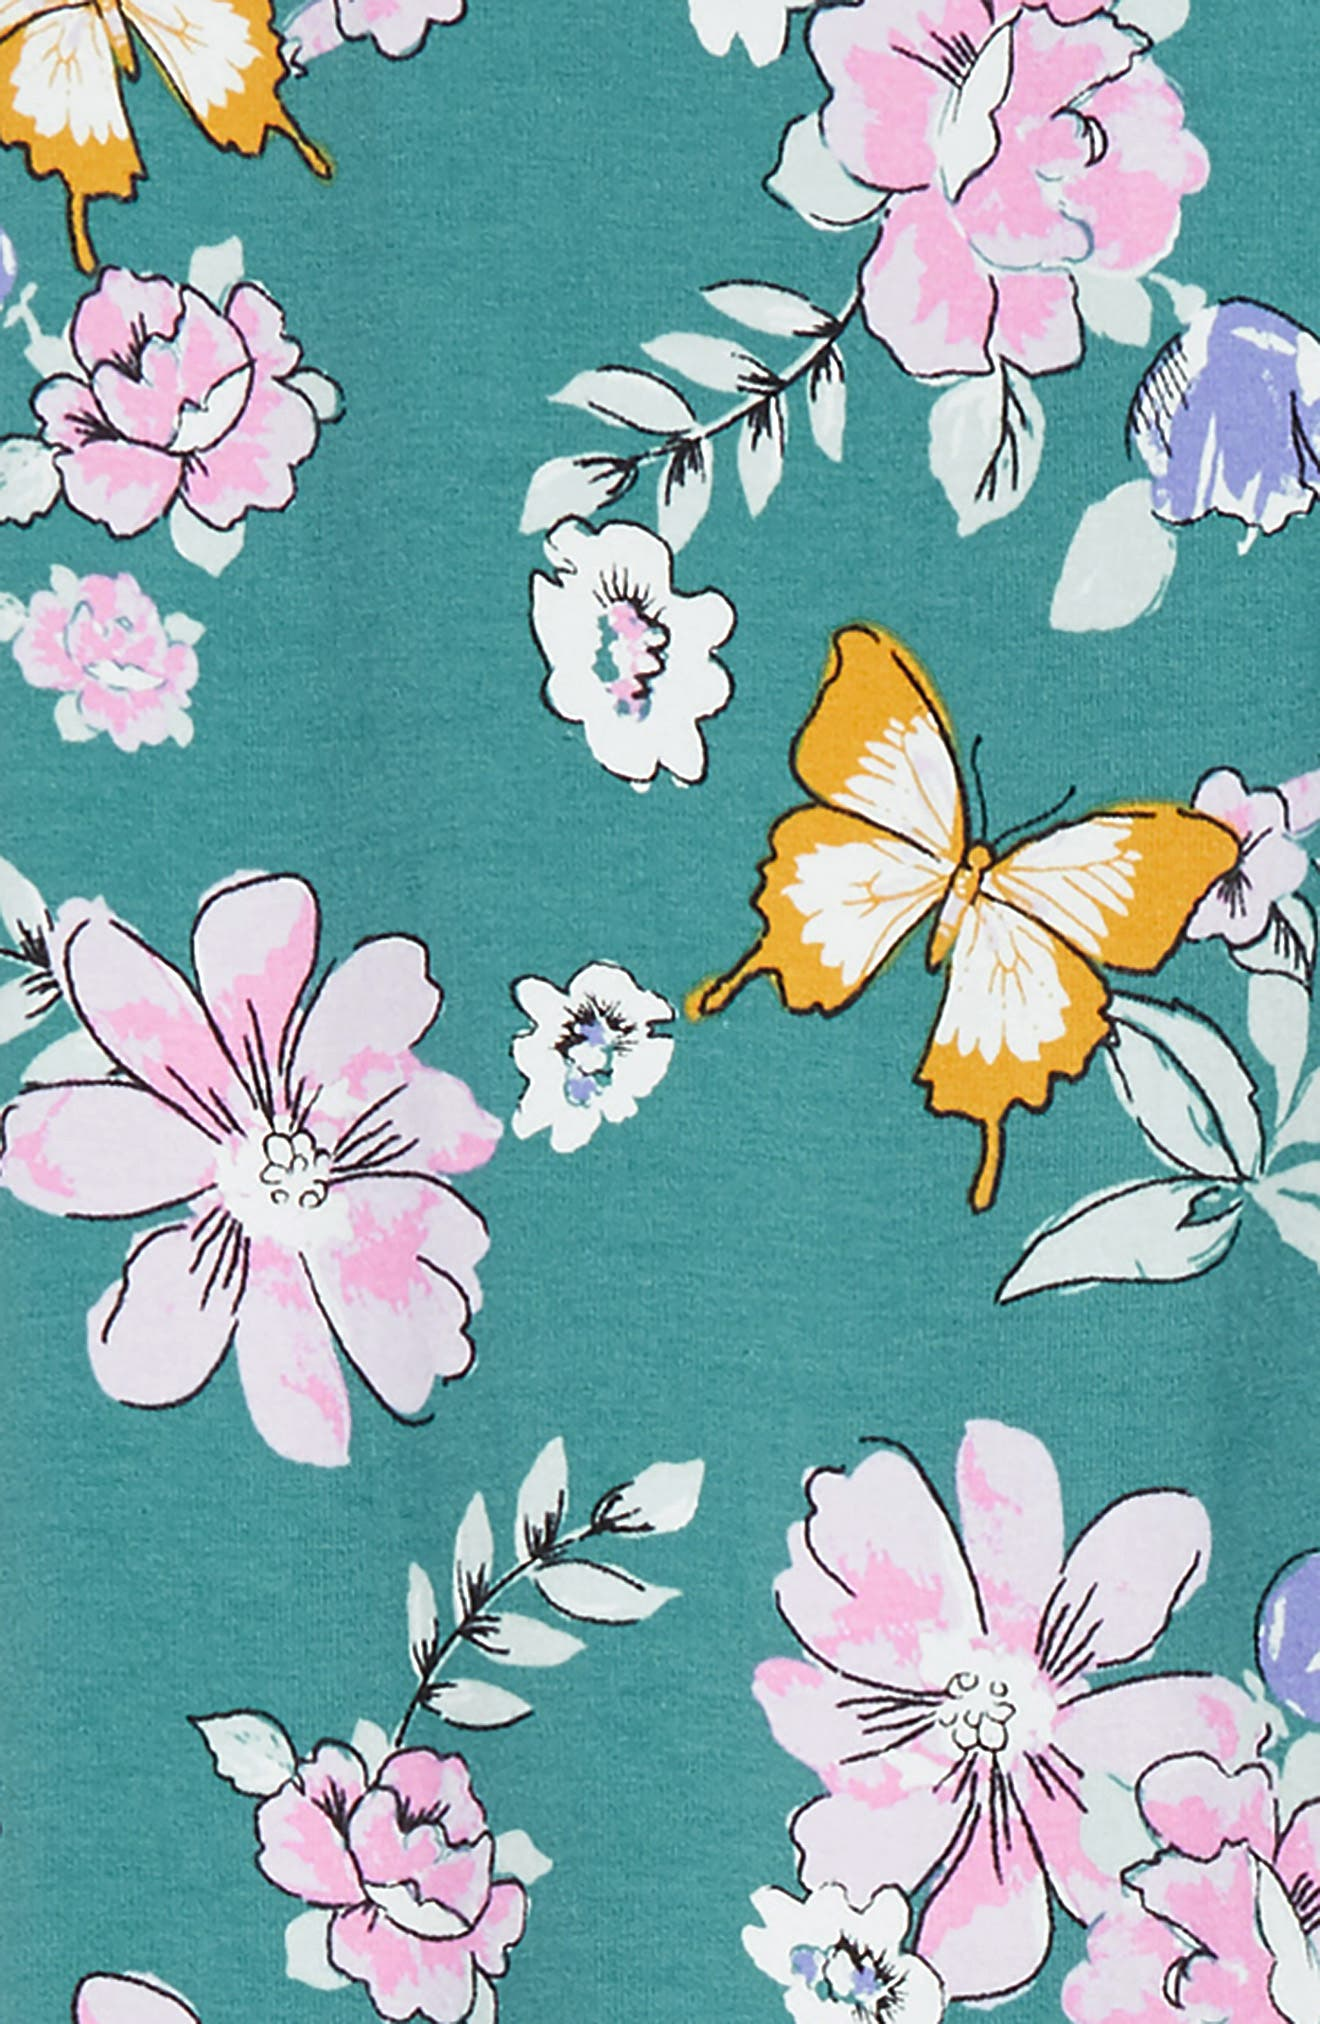 Lara Floral Blossom Leggings,                             Alternate thumbnail 2, color,                             TEAL